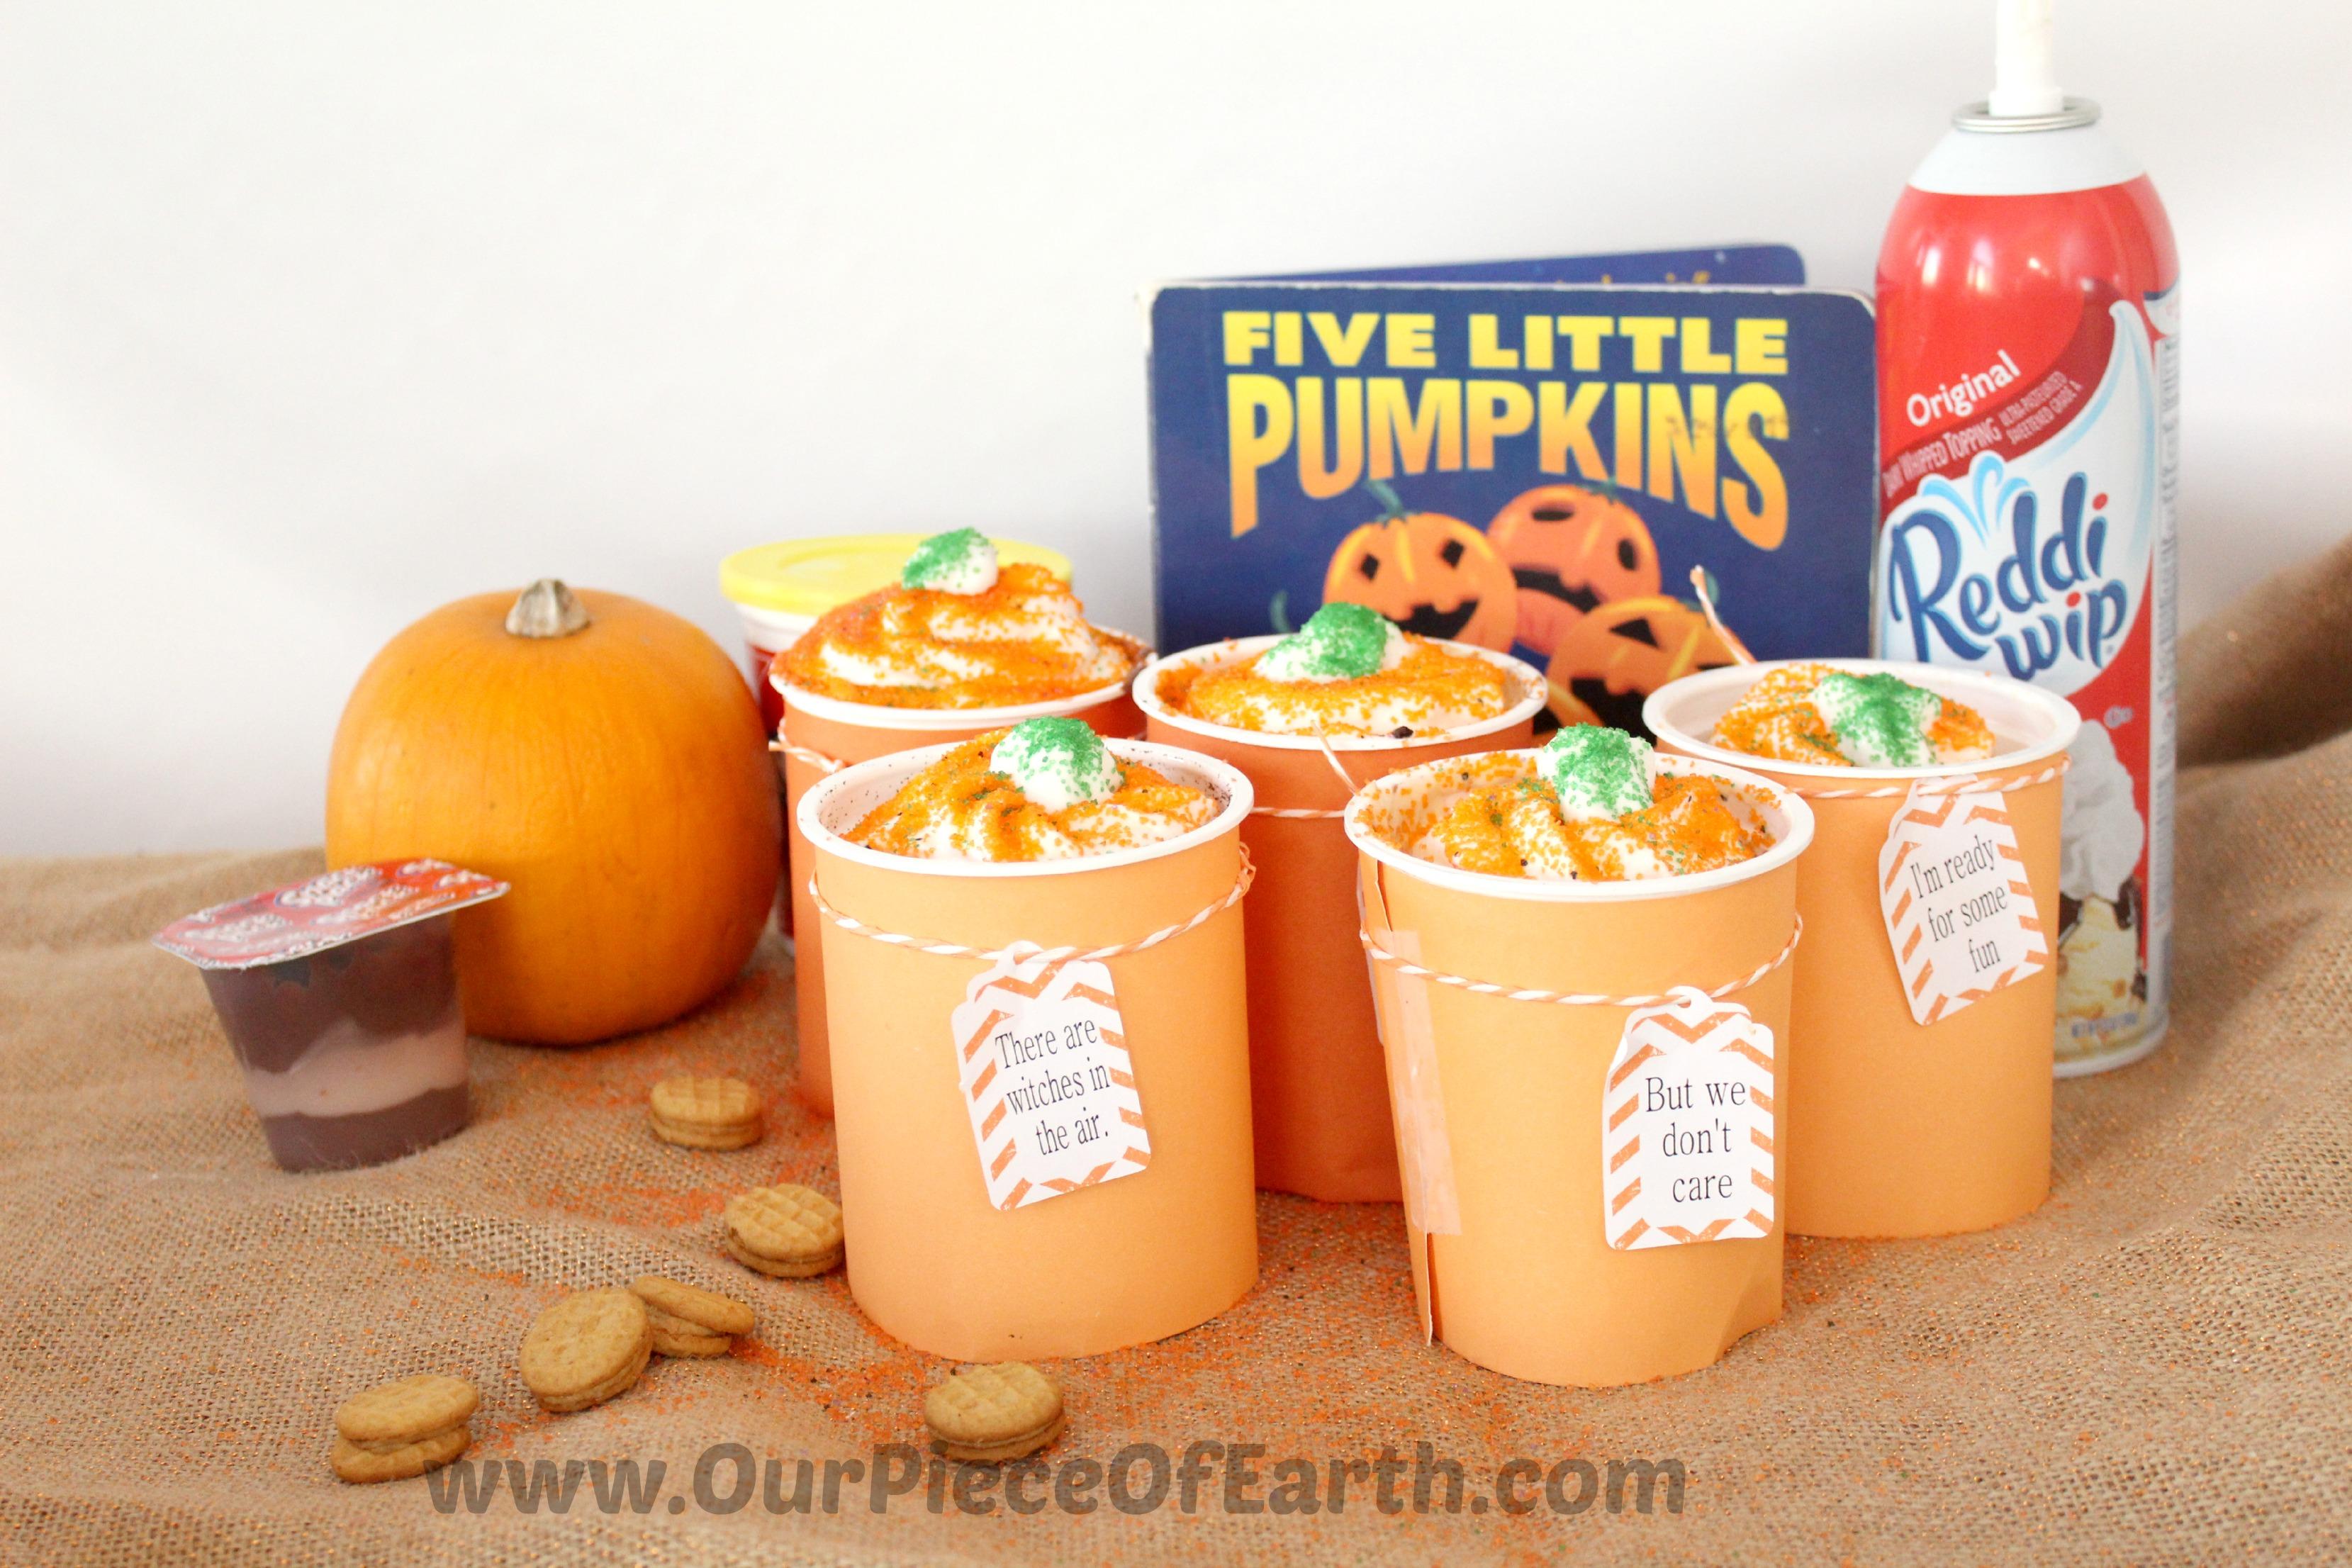 5 Little Pumpkins Book Snack Idea